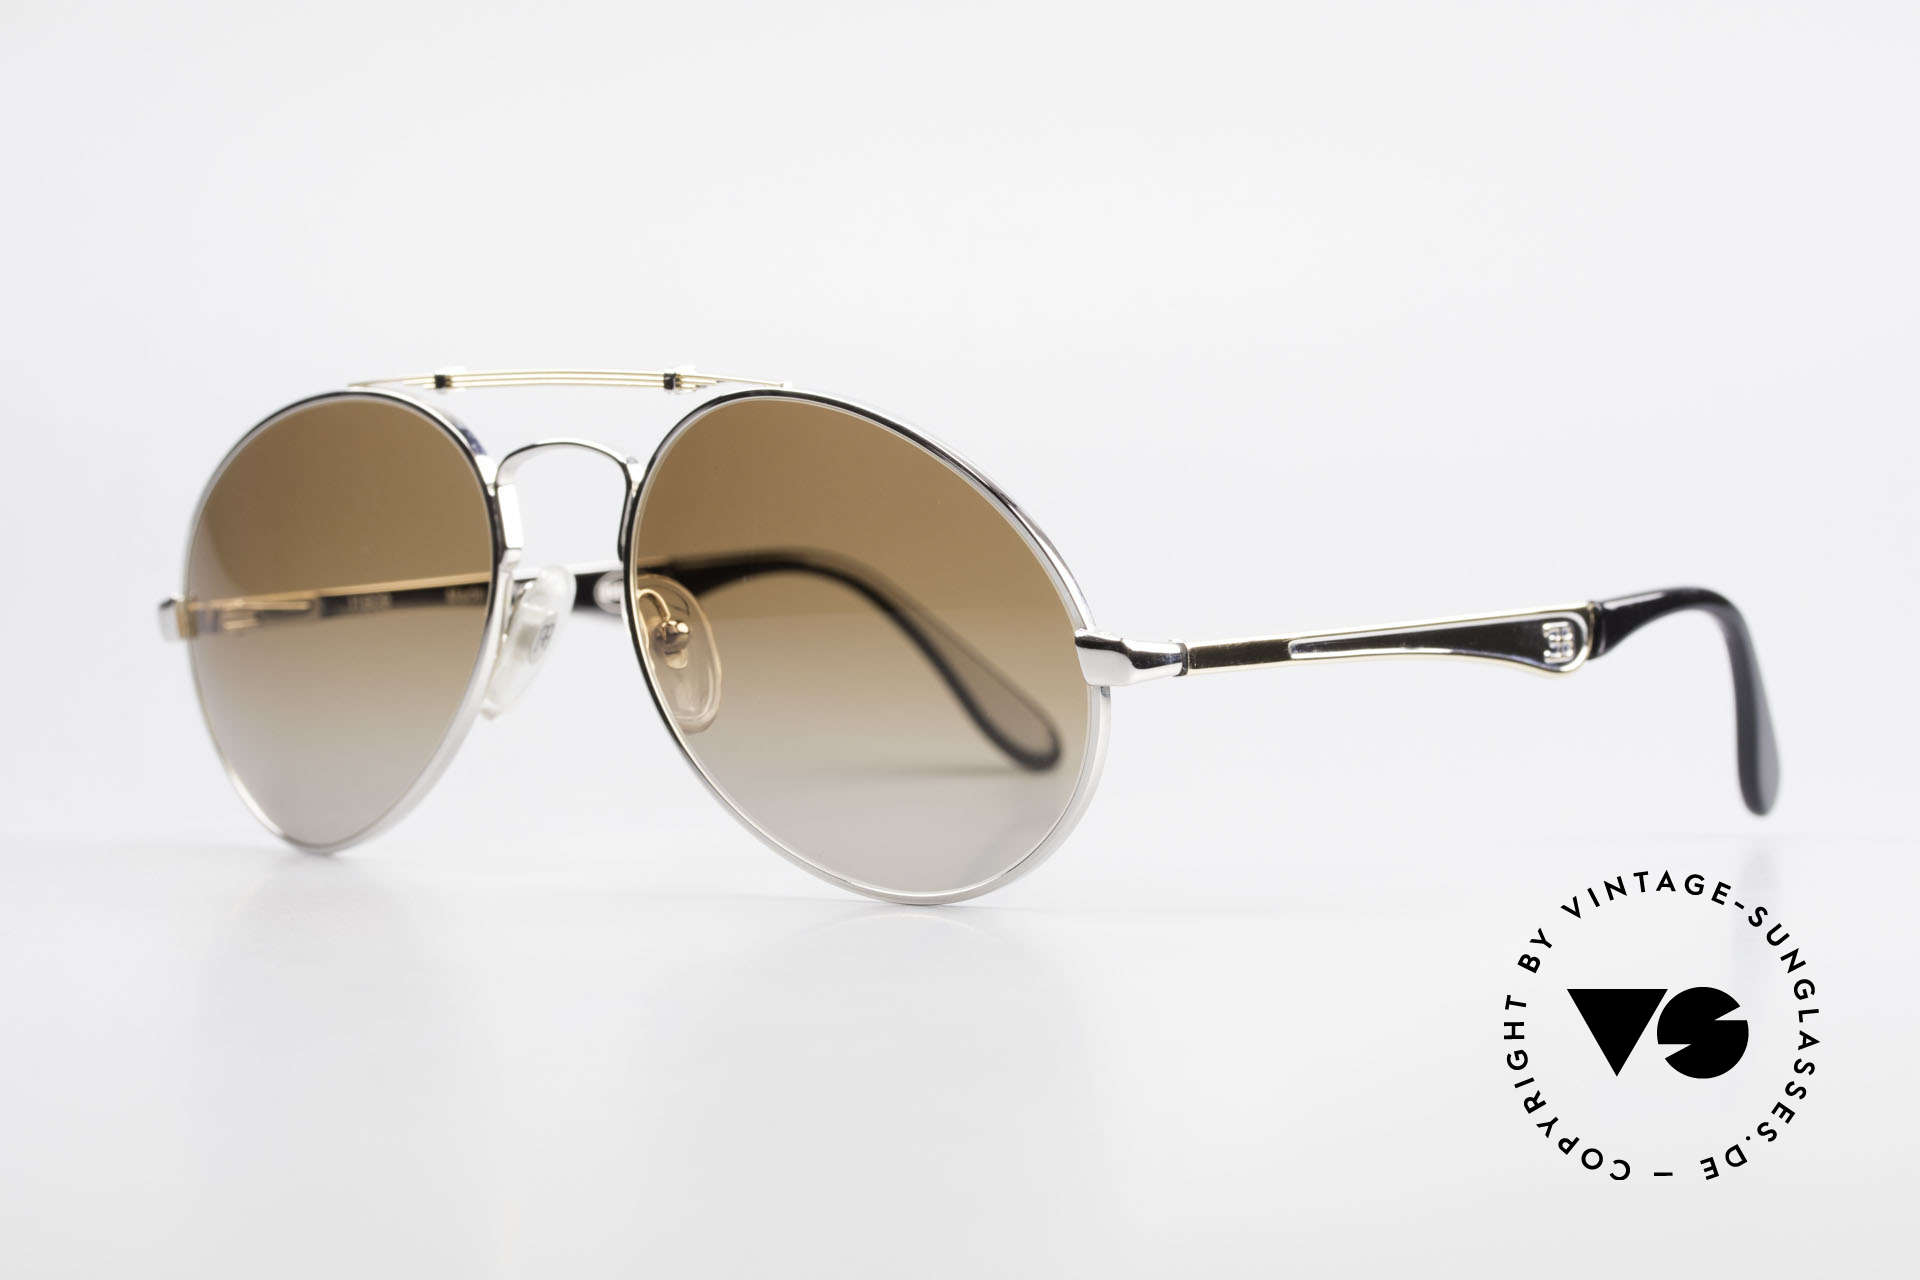 Bugatti 11909 80's Luxury Sunglasses Men, no tear drop, no aviator, but just Bugatti shape, Made for Men